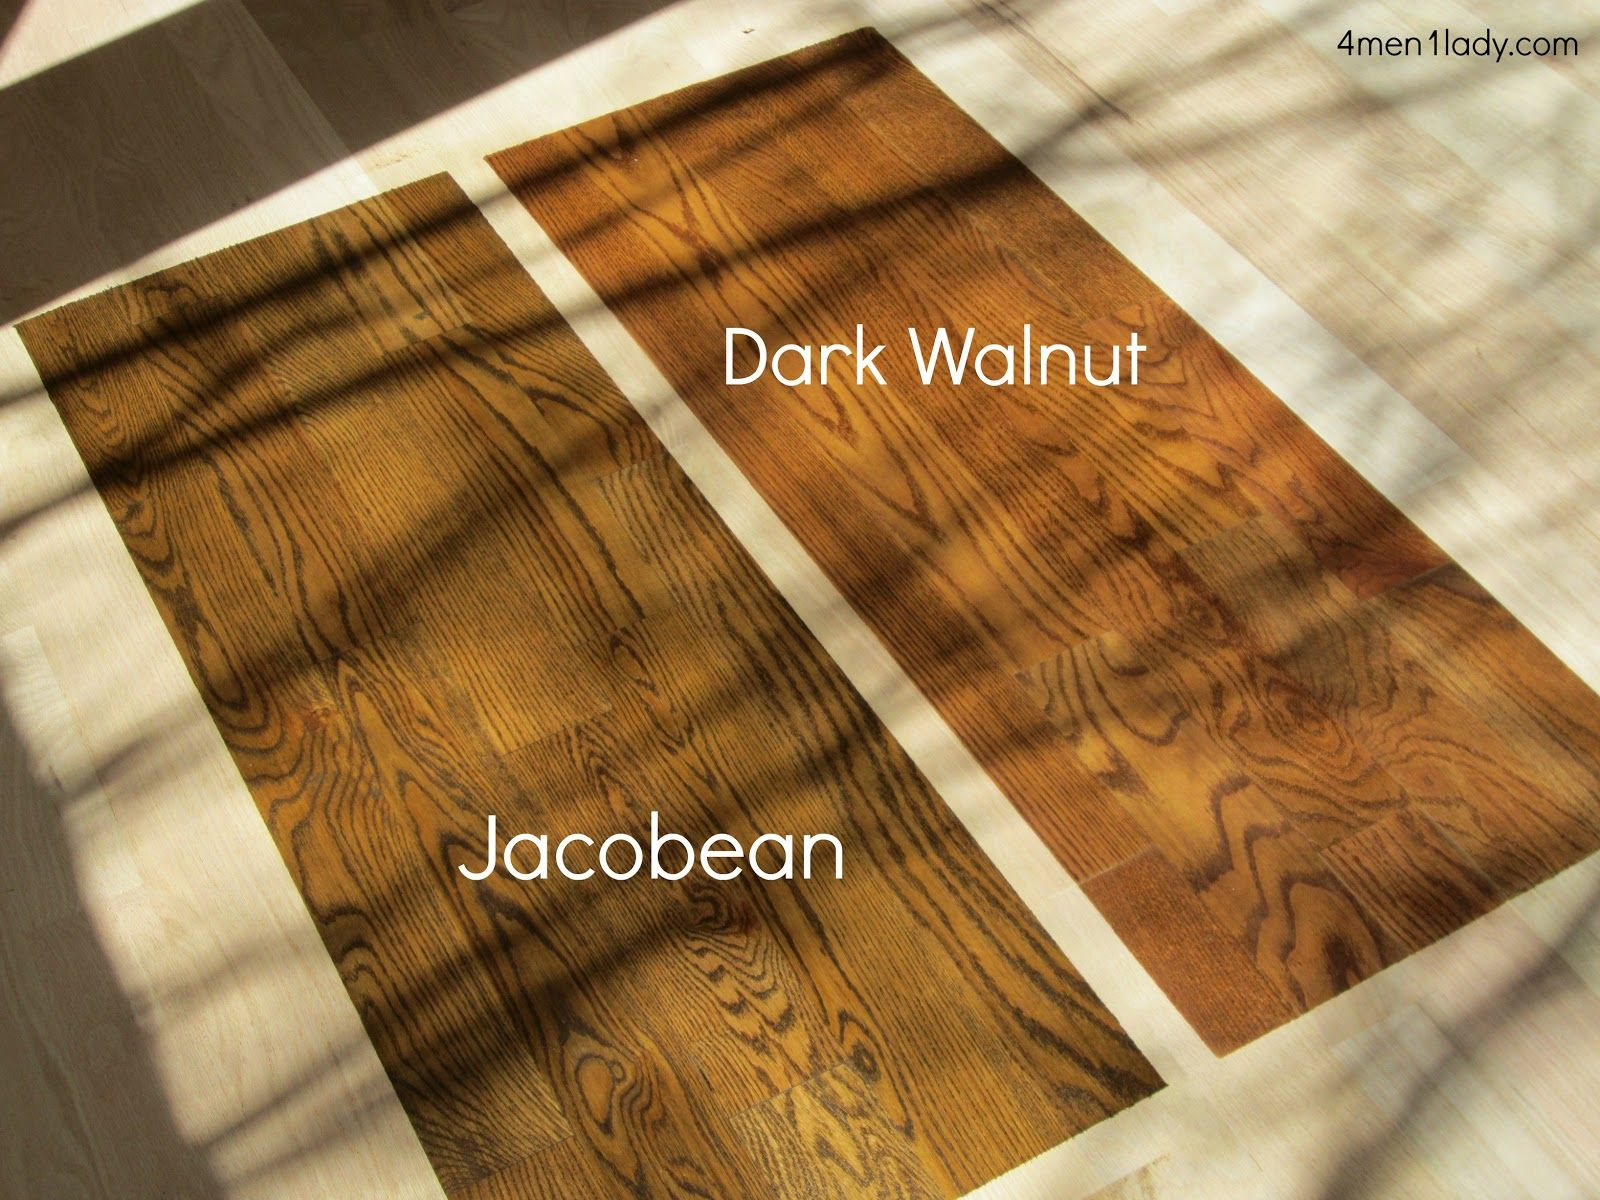 jacobean vs dark walnut - Google Search | Windows & Doors ...